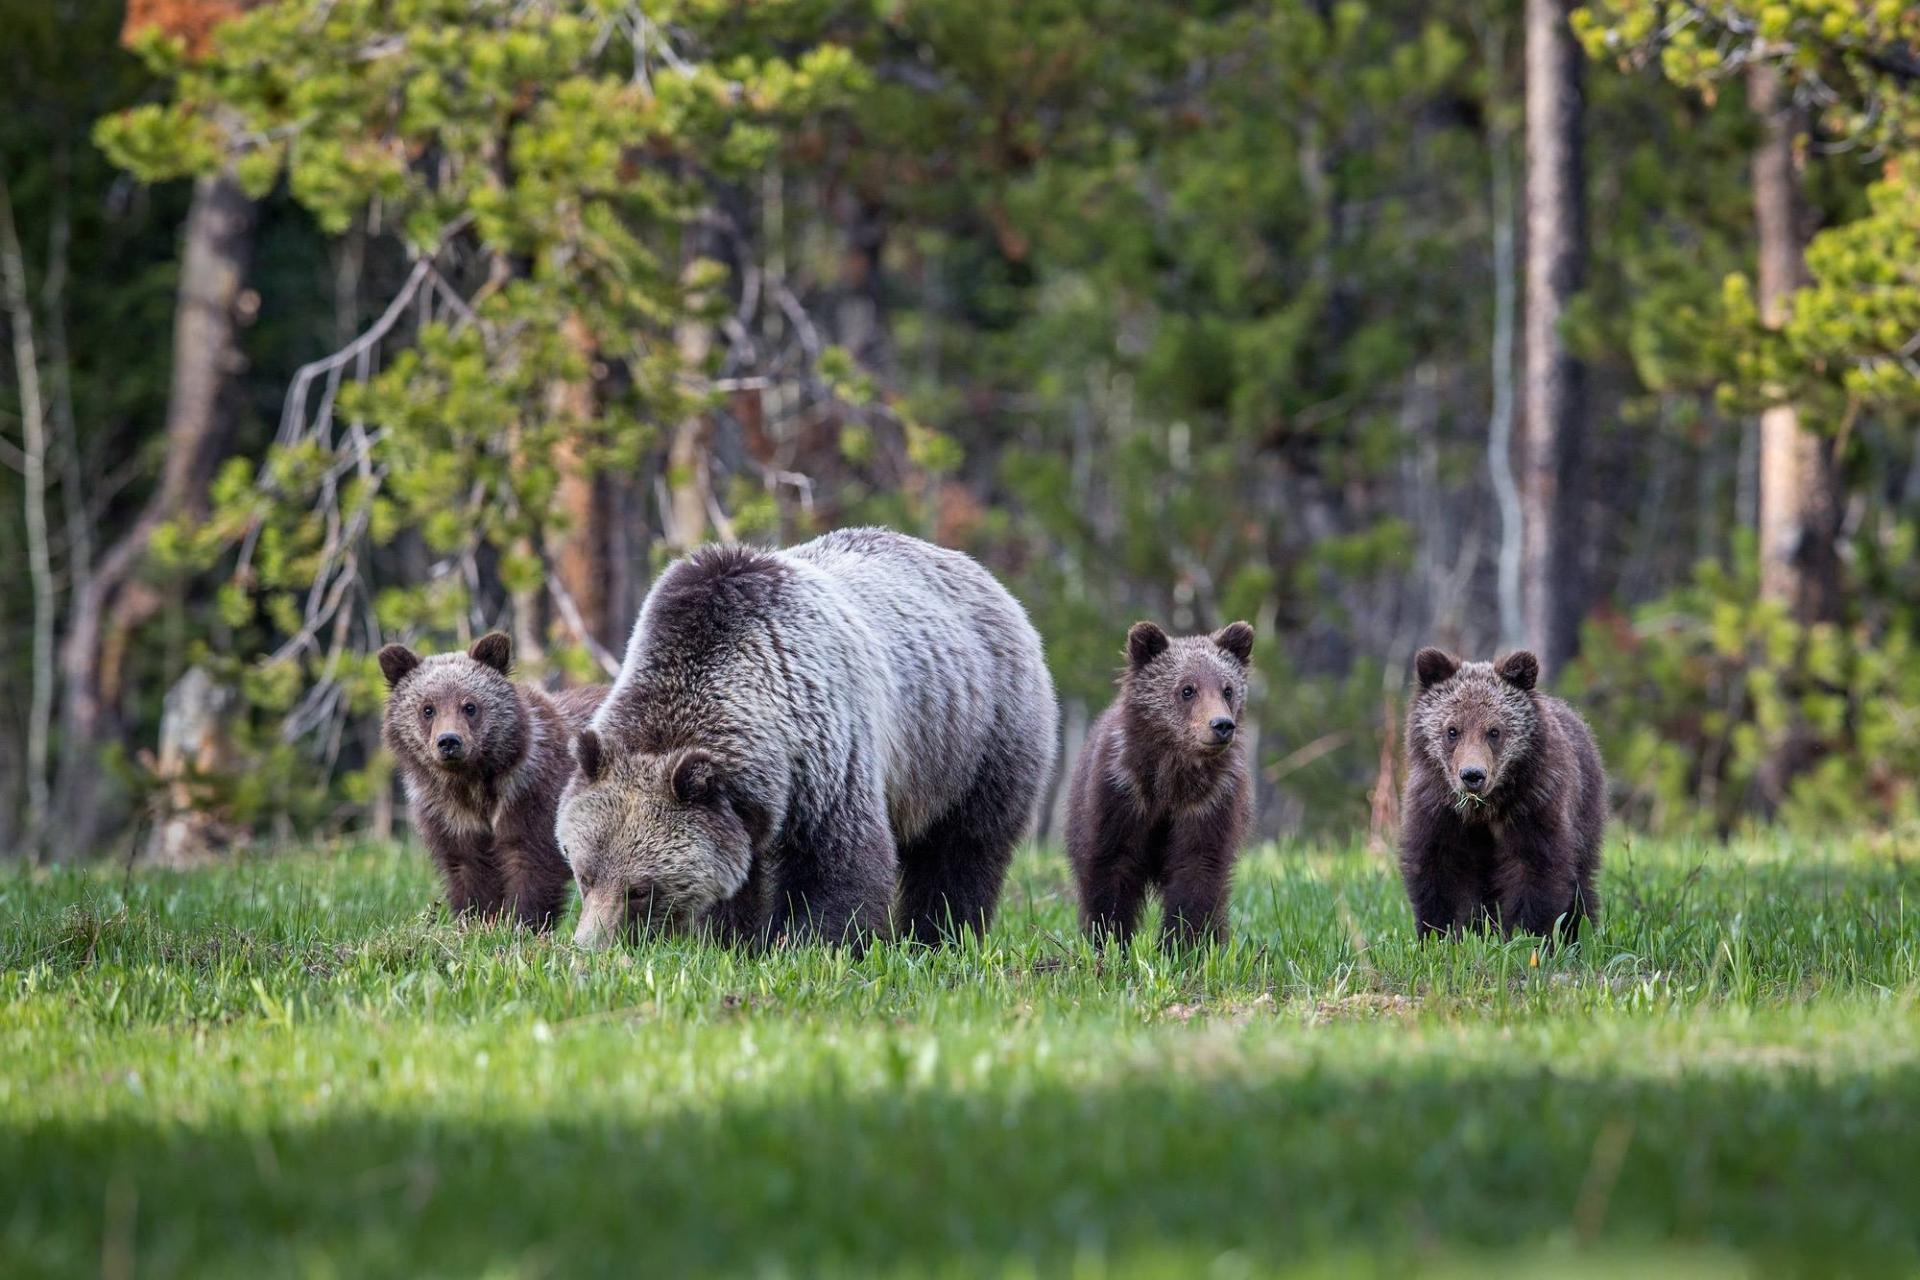 fotos de osos  im u00e1genes del oso pardo en la naturaleza